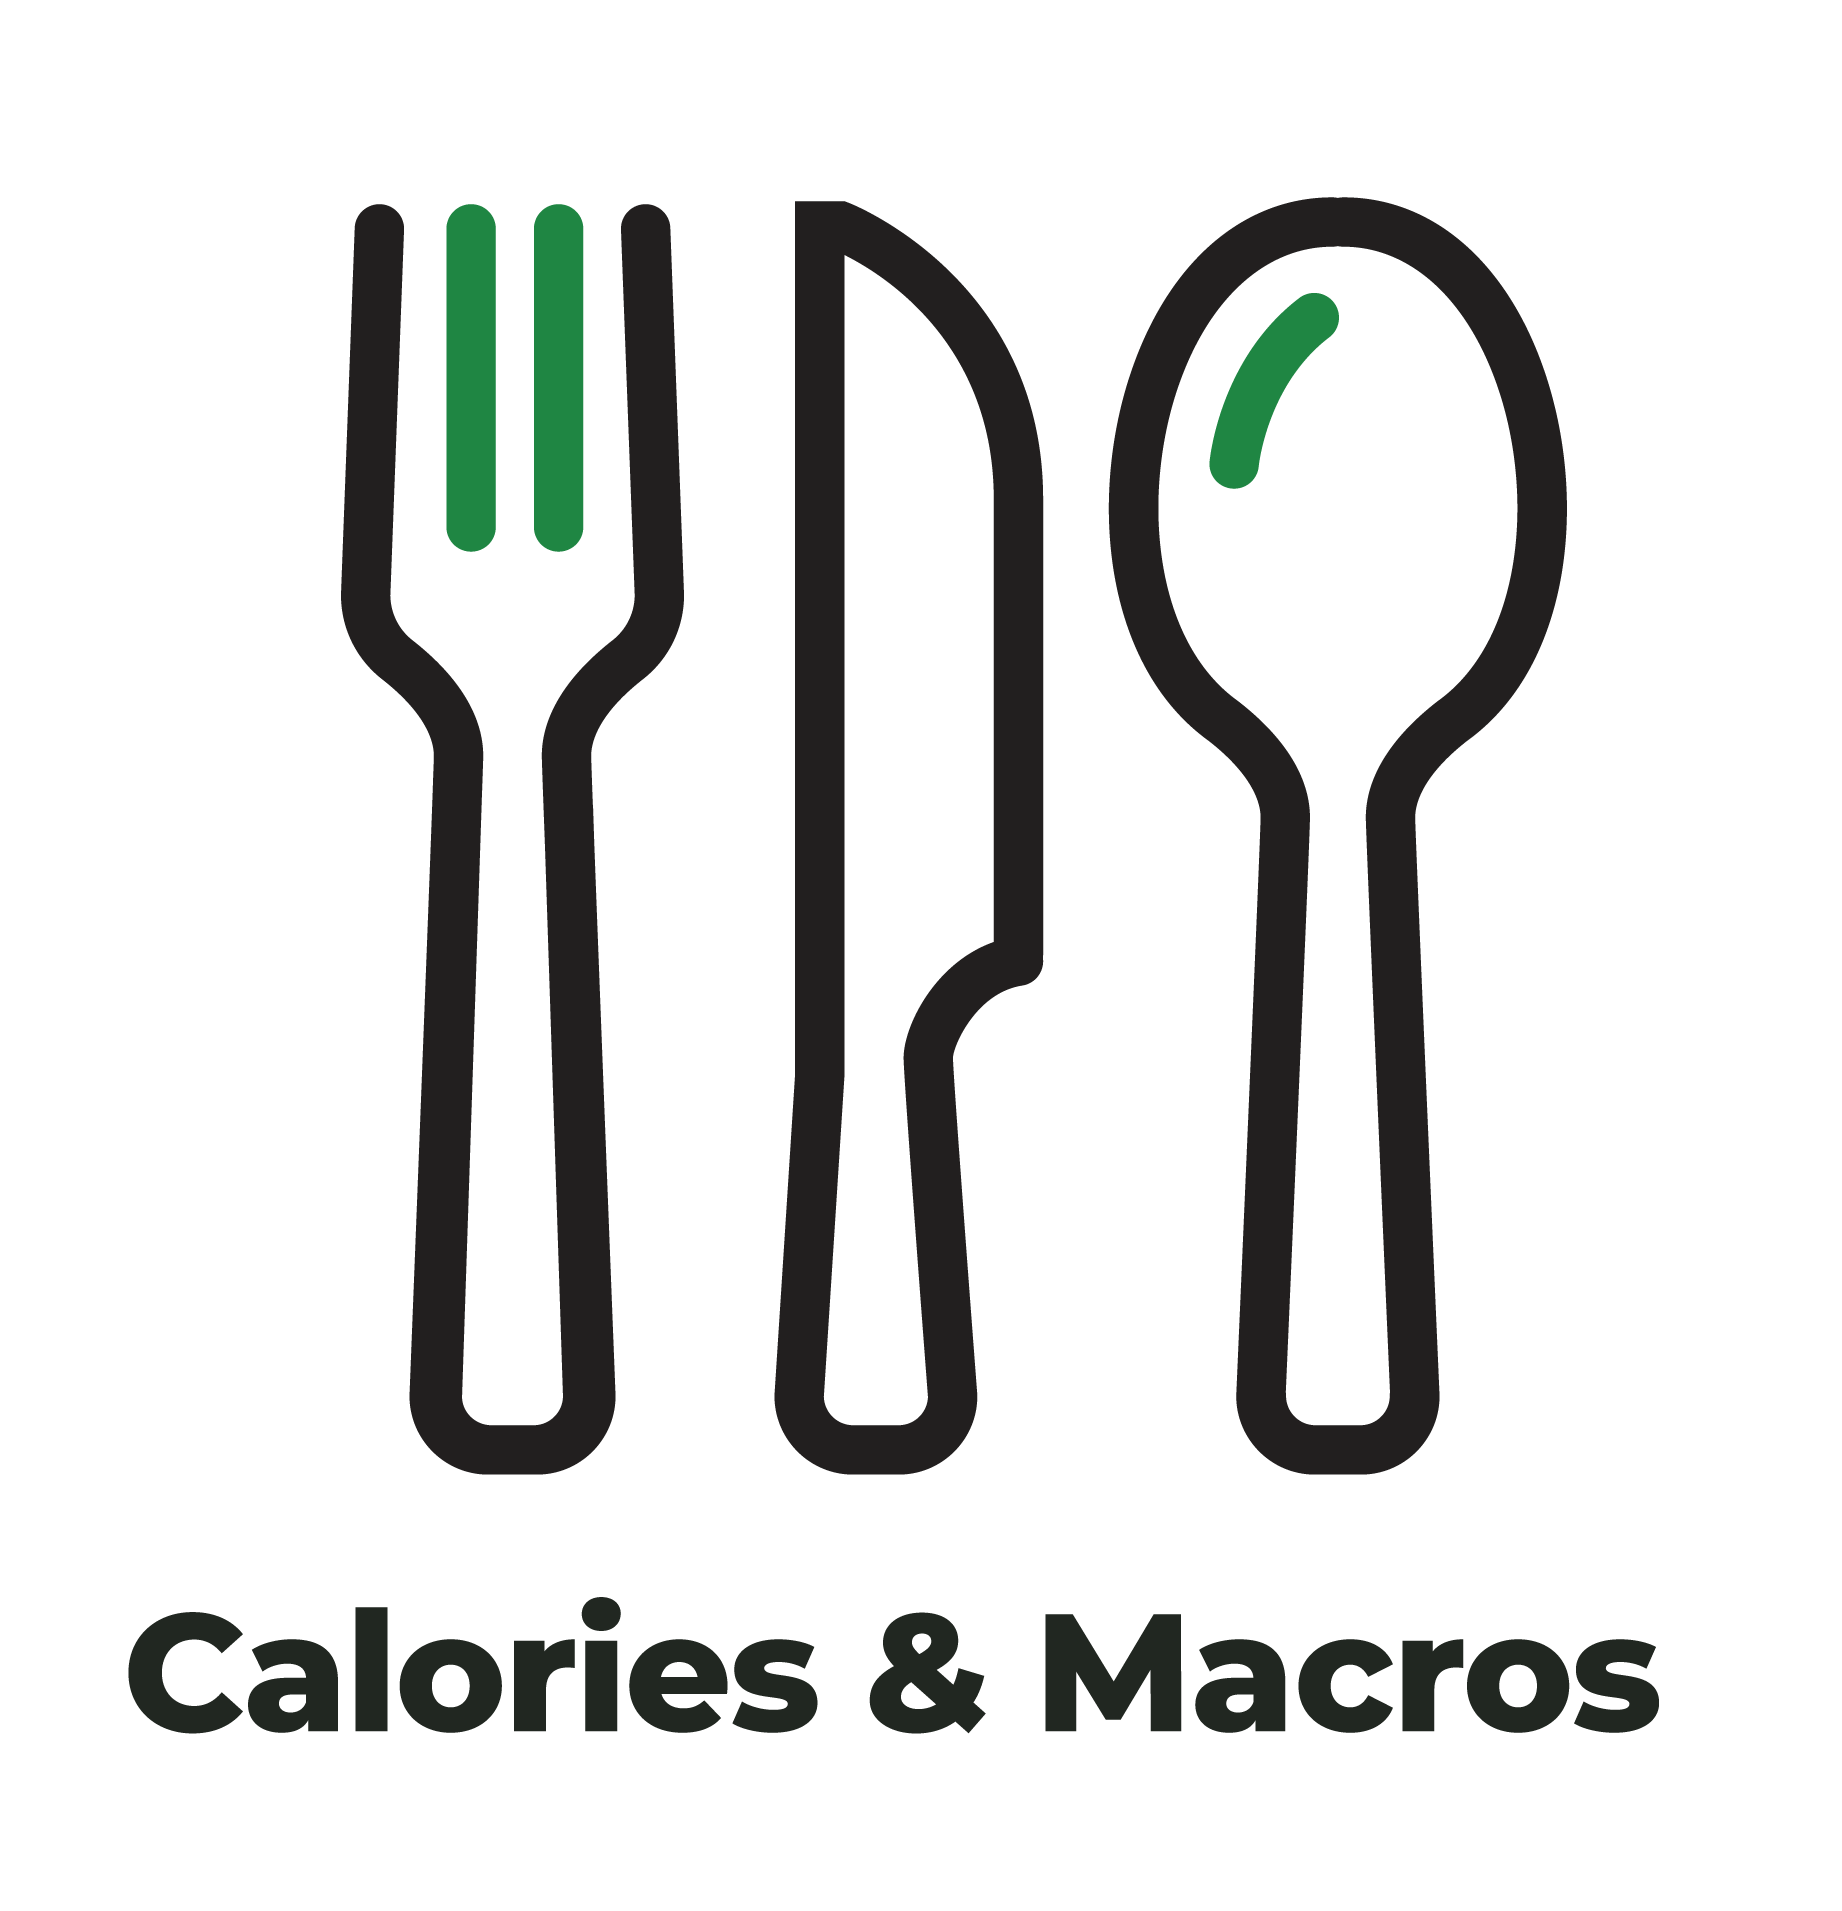 TC-Calories+Macros-01